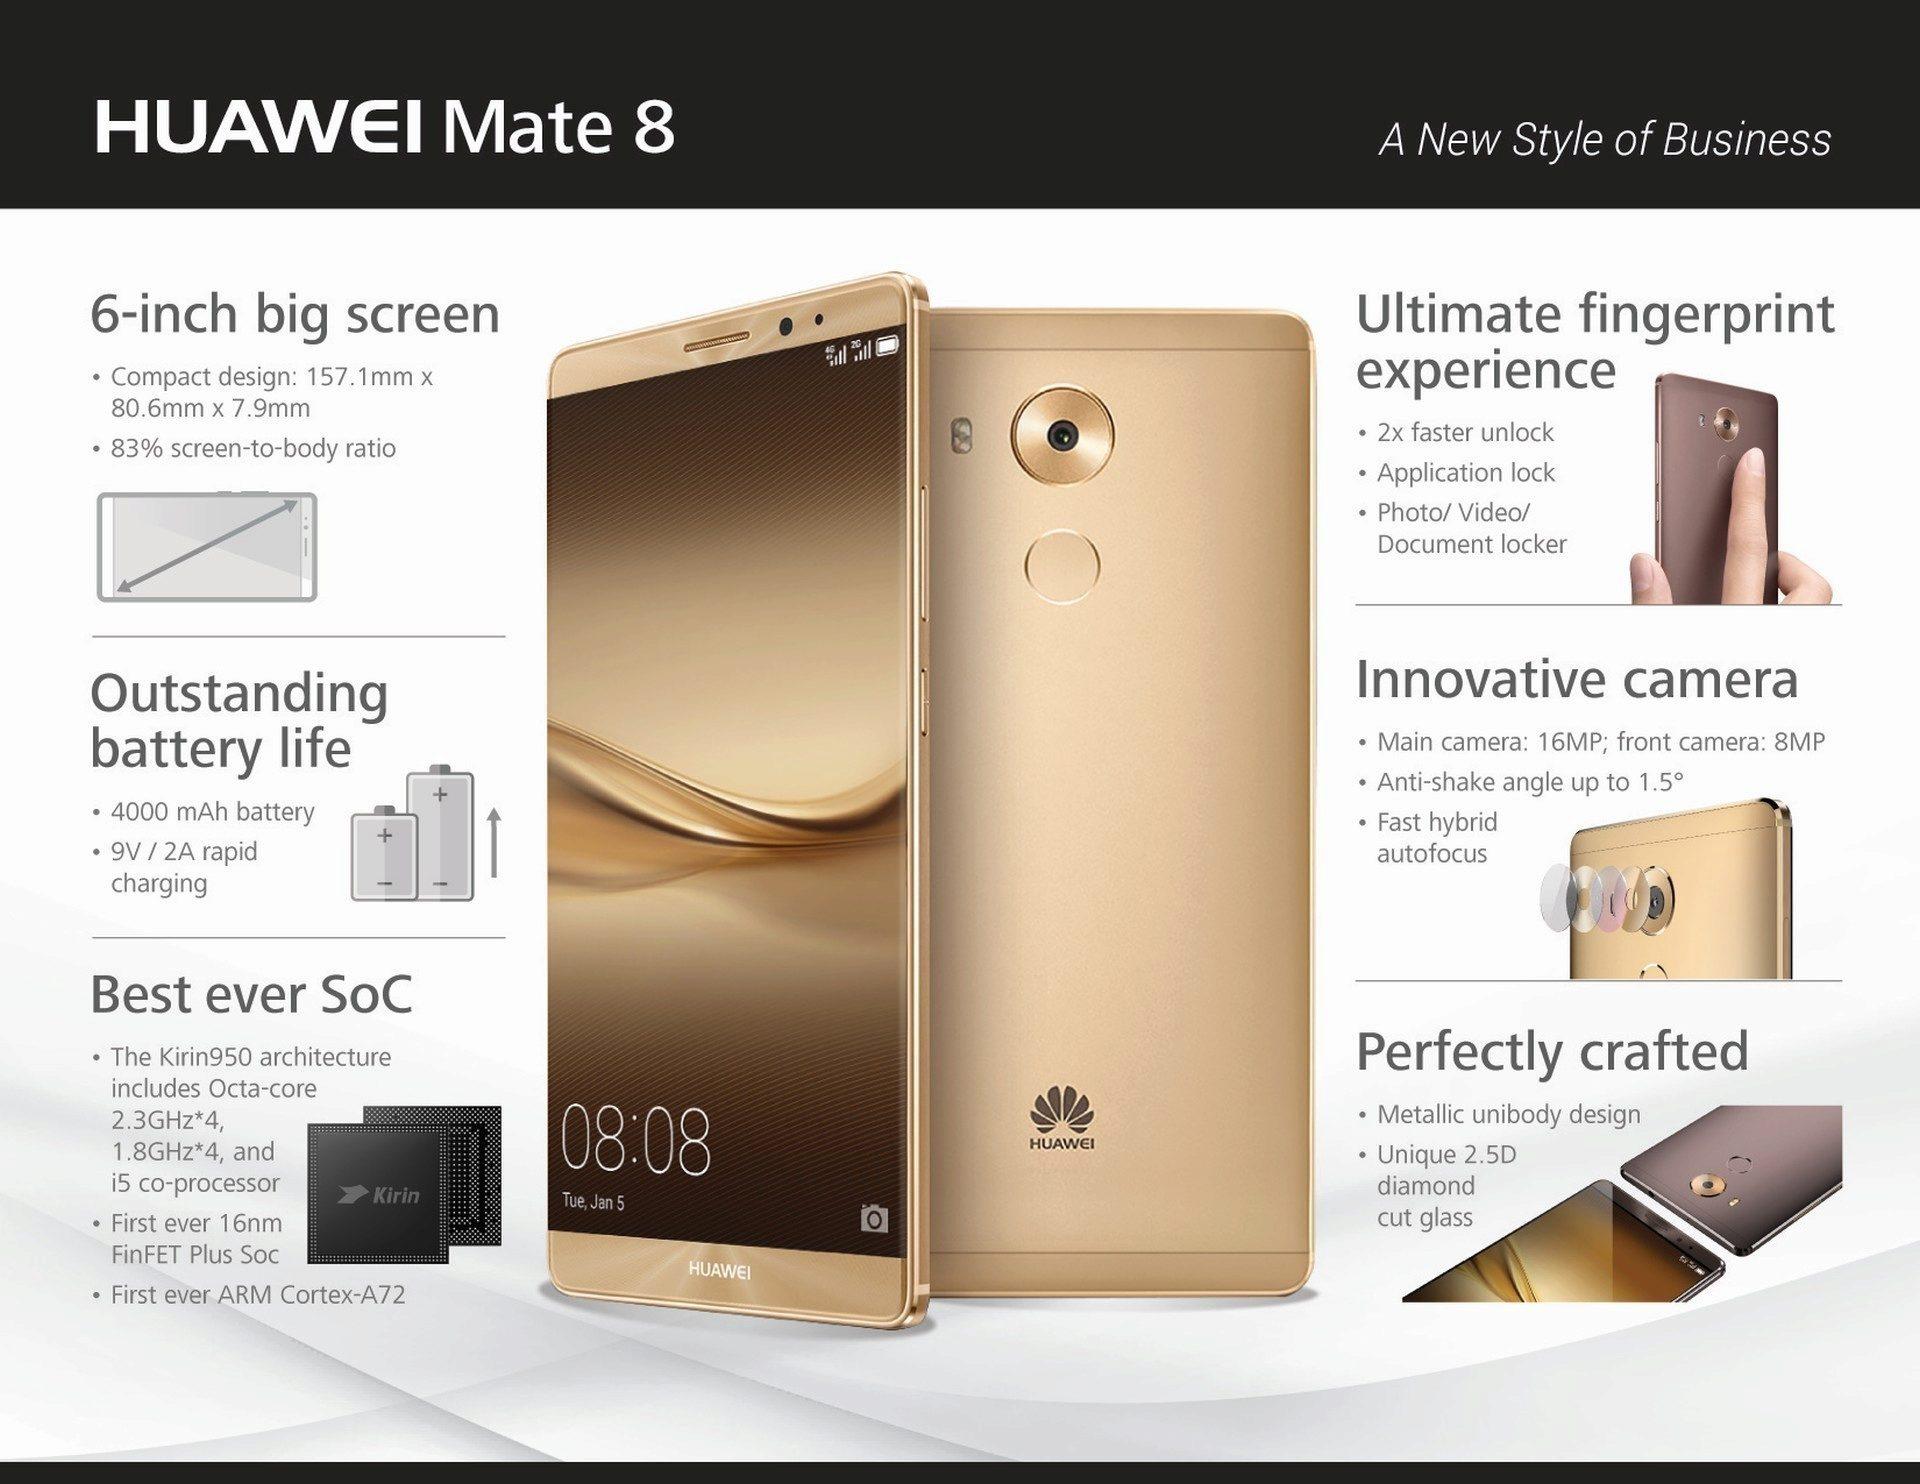 Telefon Huawei Mate 8 Se Chyst 225 Do Prodeje Zn 225 Me Cenu Pro N 225 Trh